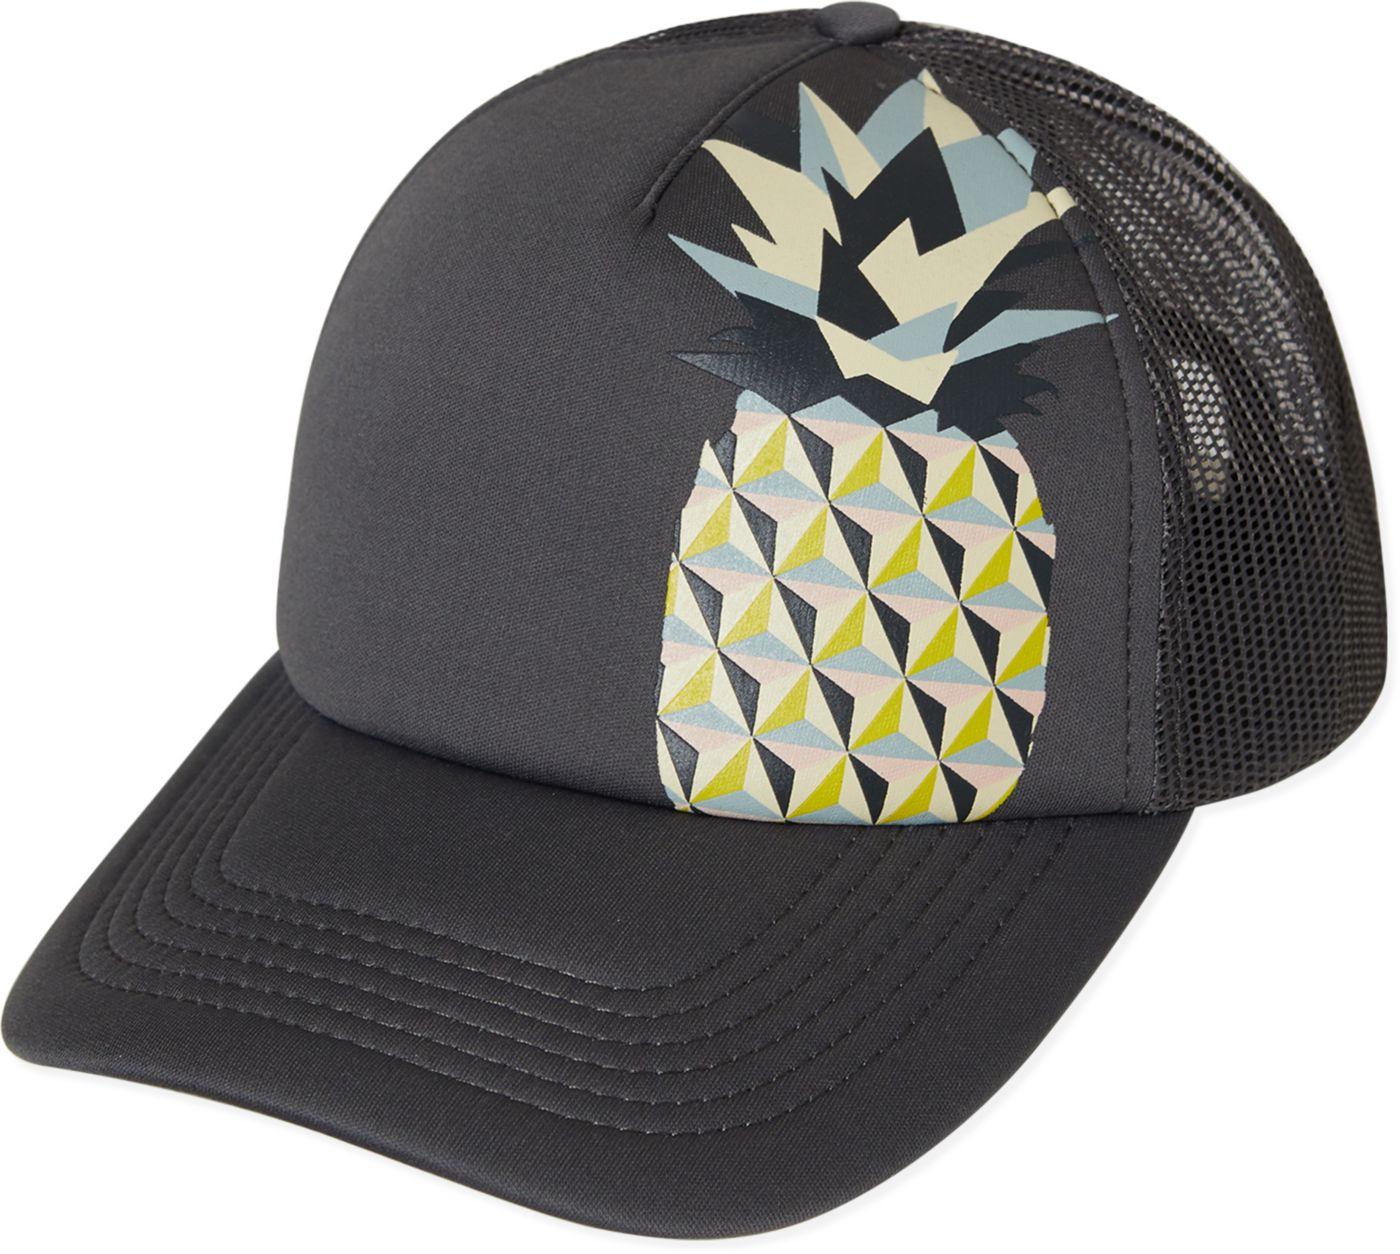 O'Neill Women's All Out Trucker Hat